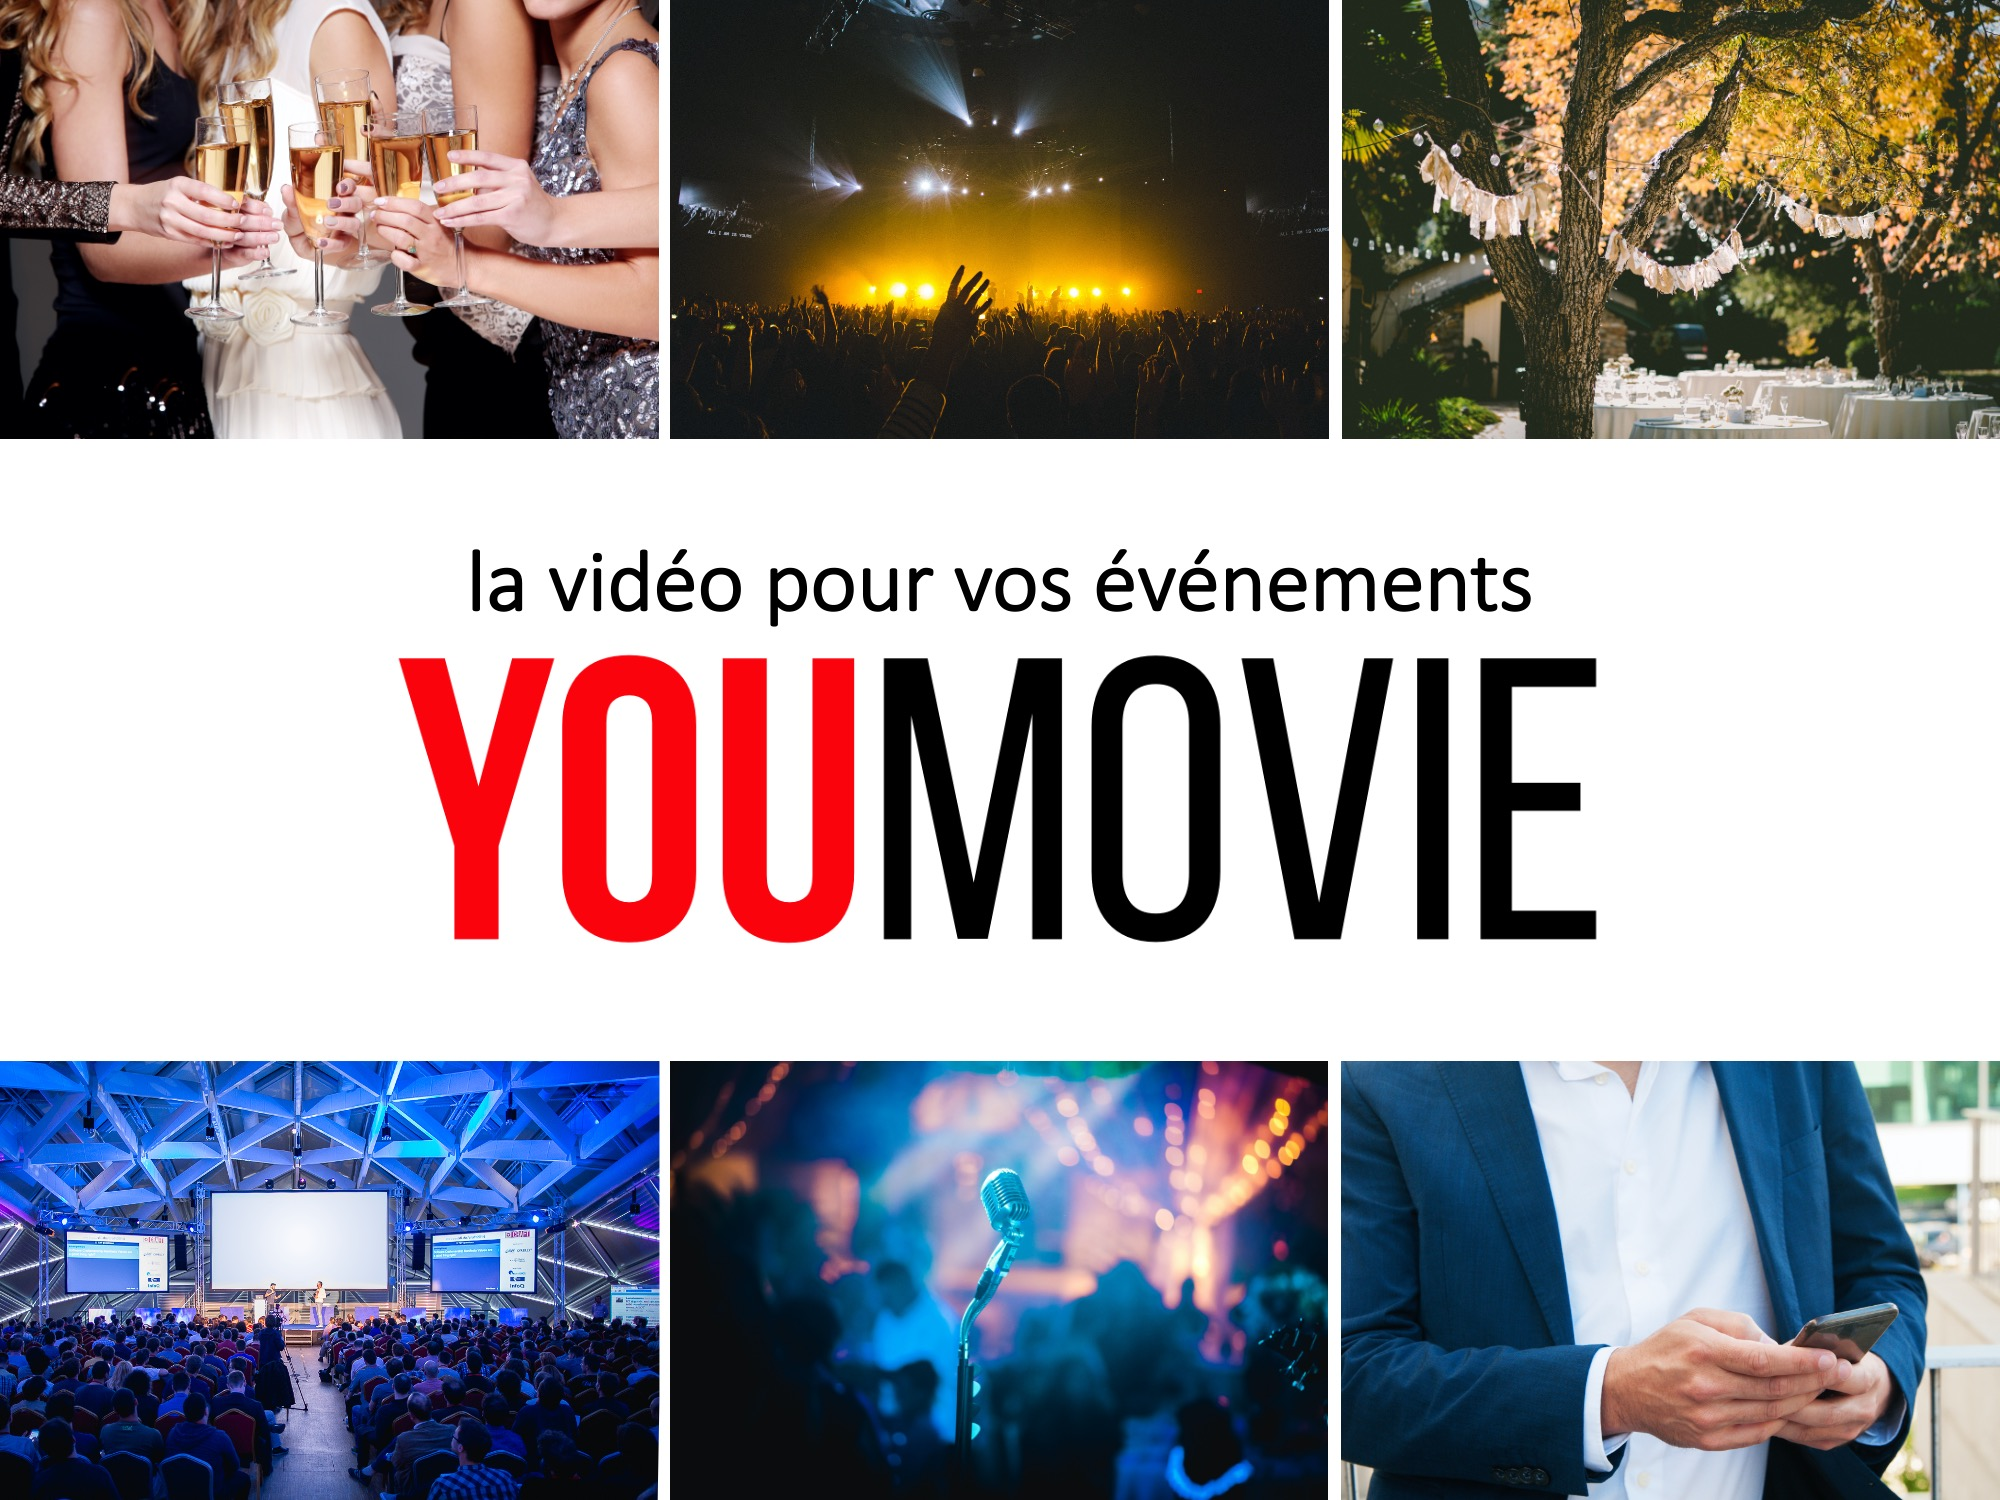 kwakoo-event-videaste-you-movie-01